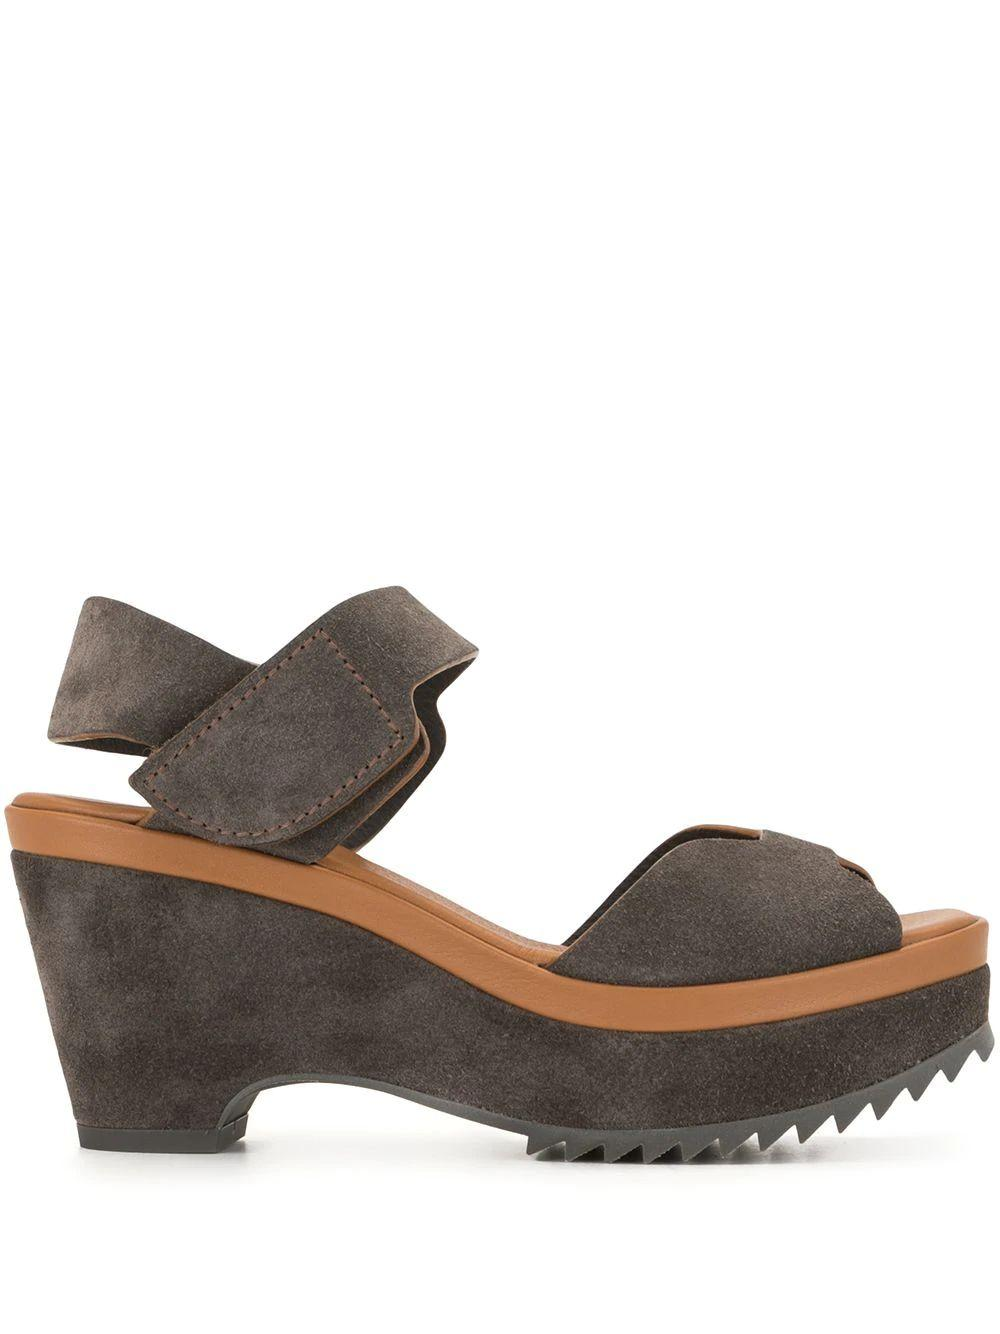 Fah Suede Platform Sandal